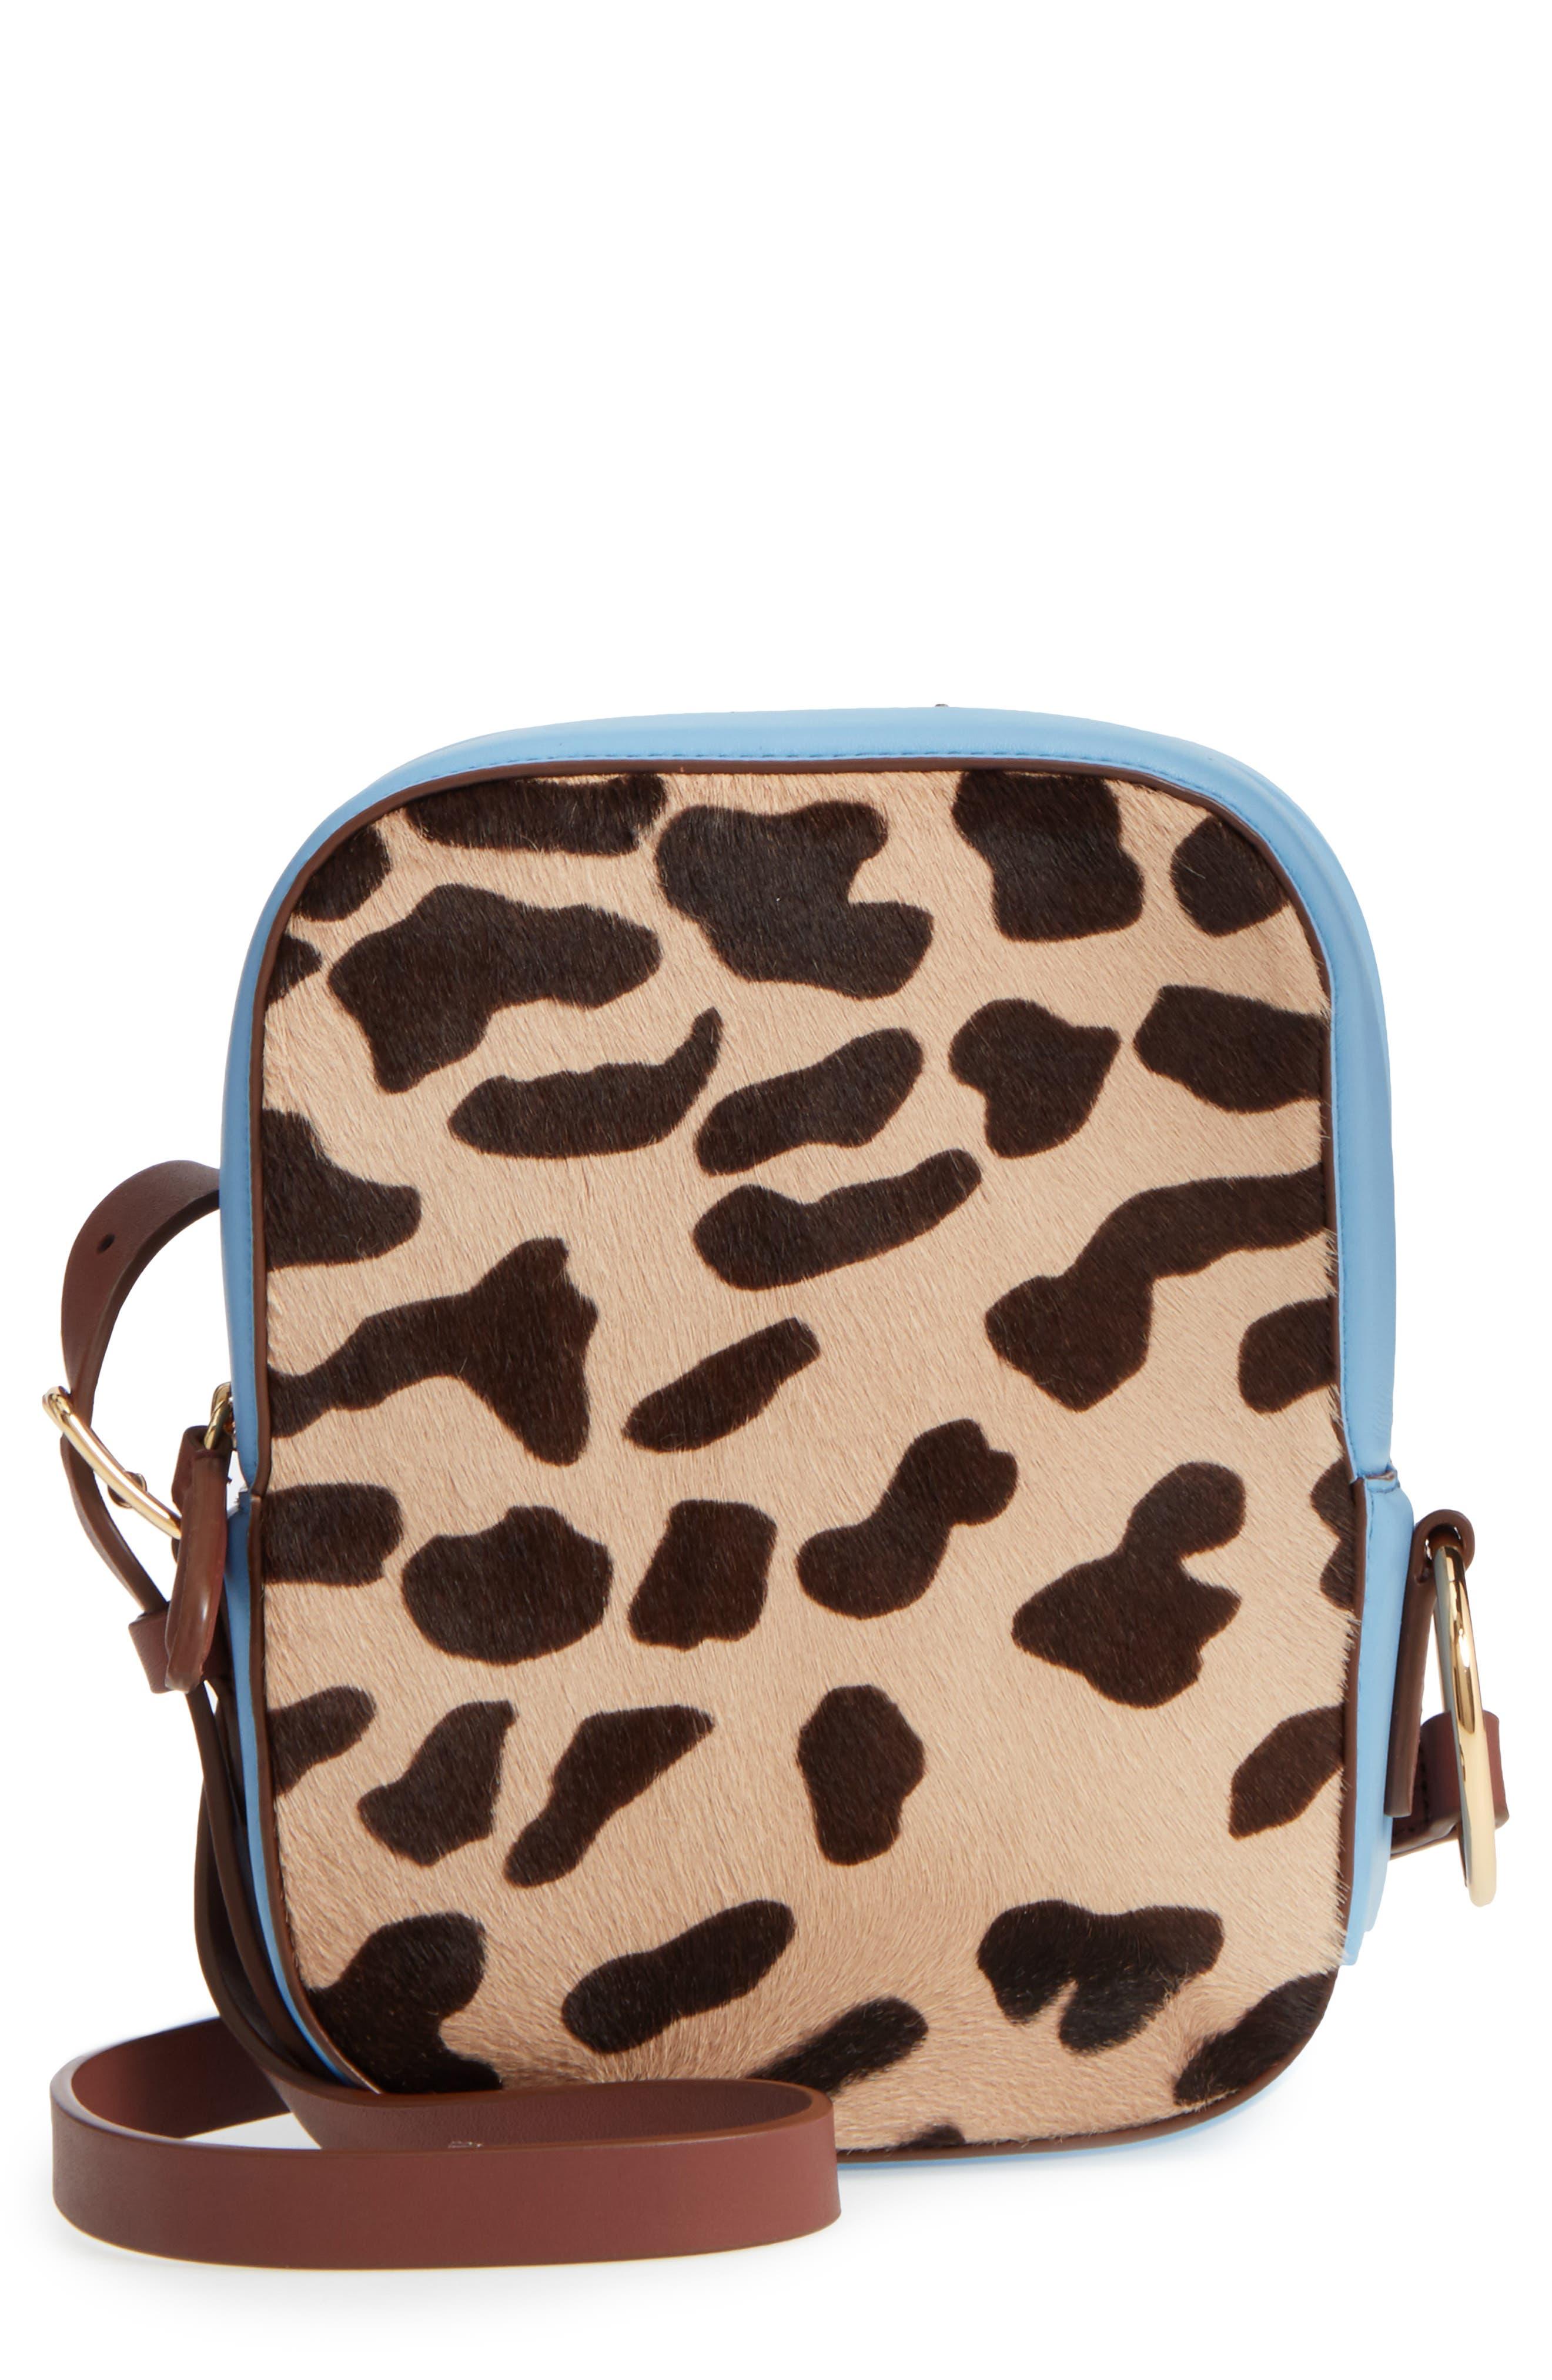 Leather & Genuine Calf Hair Camera Bag,                         Main,                         color, Leopard/ Powder Blue